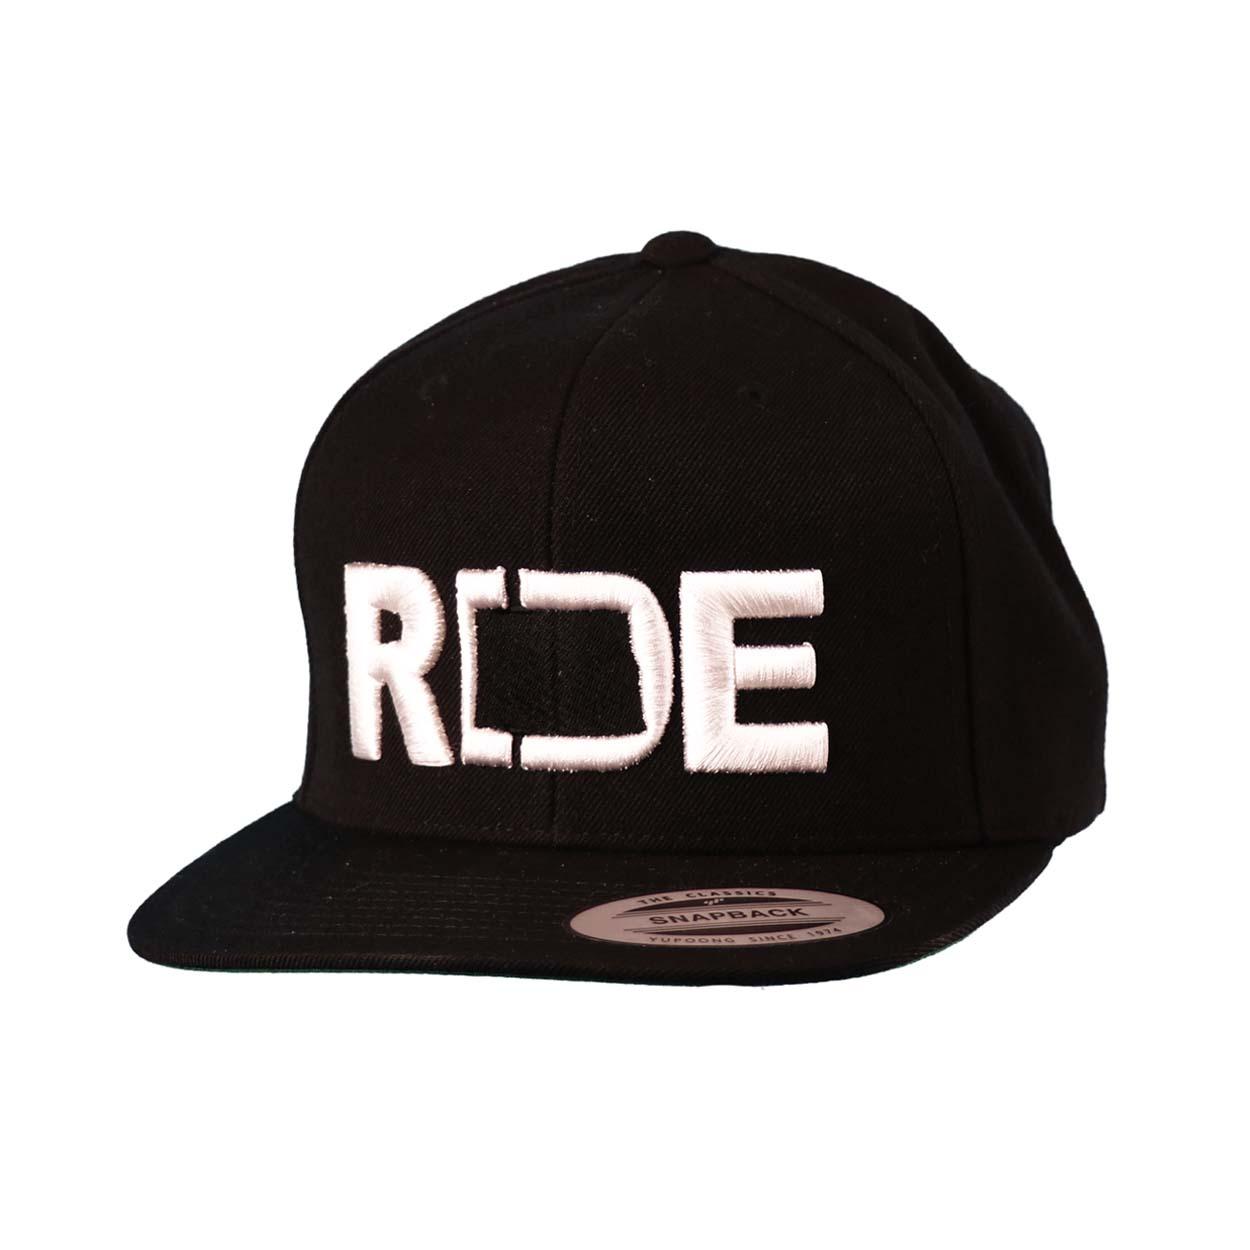 Ride North Dakota Classic Embroidered  Snapback Flat Brim Hat Black/White